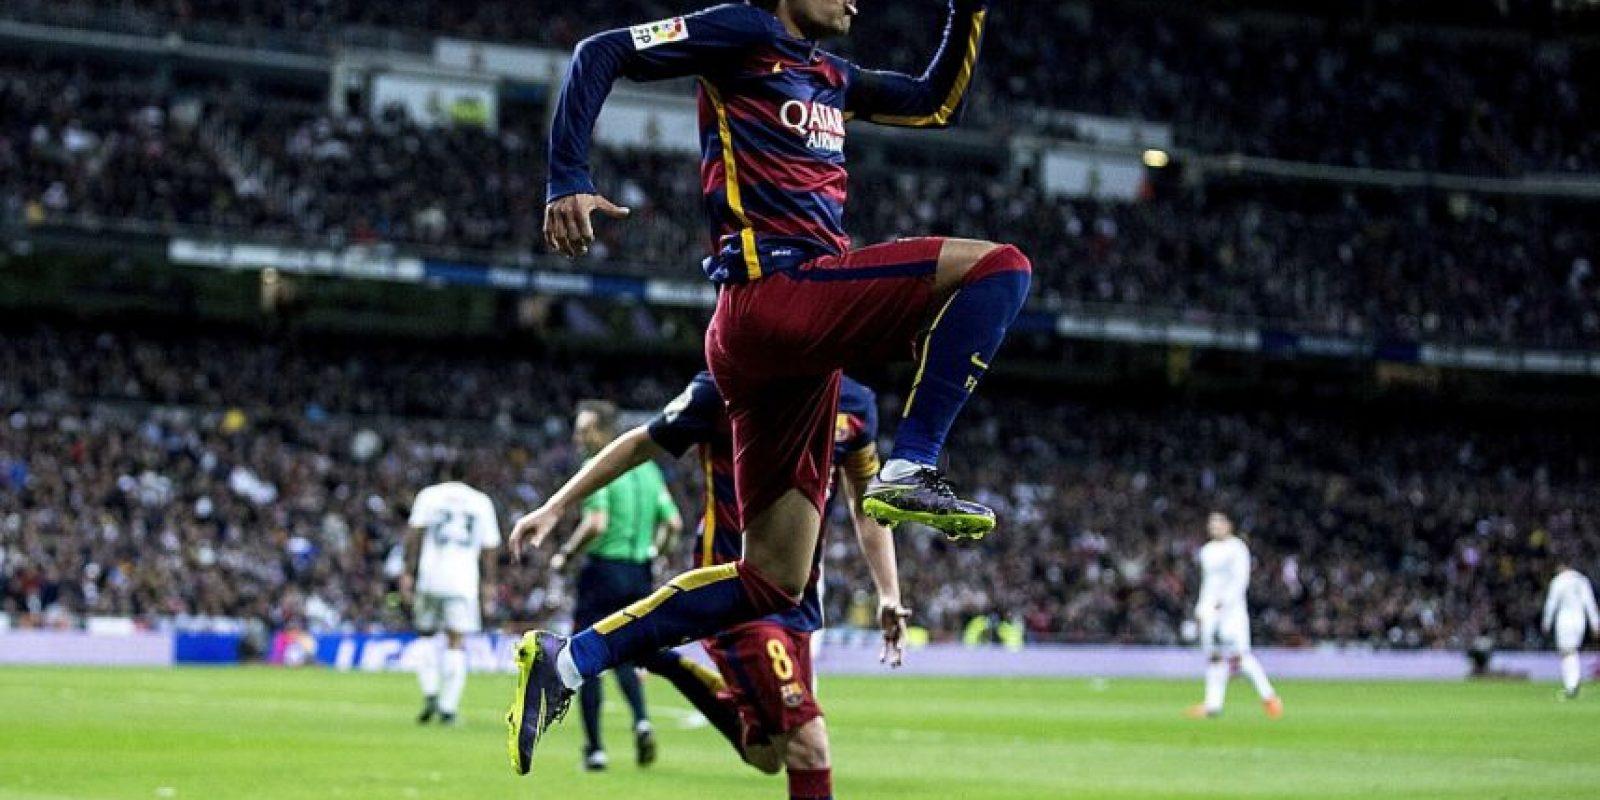 Neymar (Brasil, Barcelona, 23 años) Foto:Getty Images